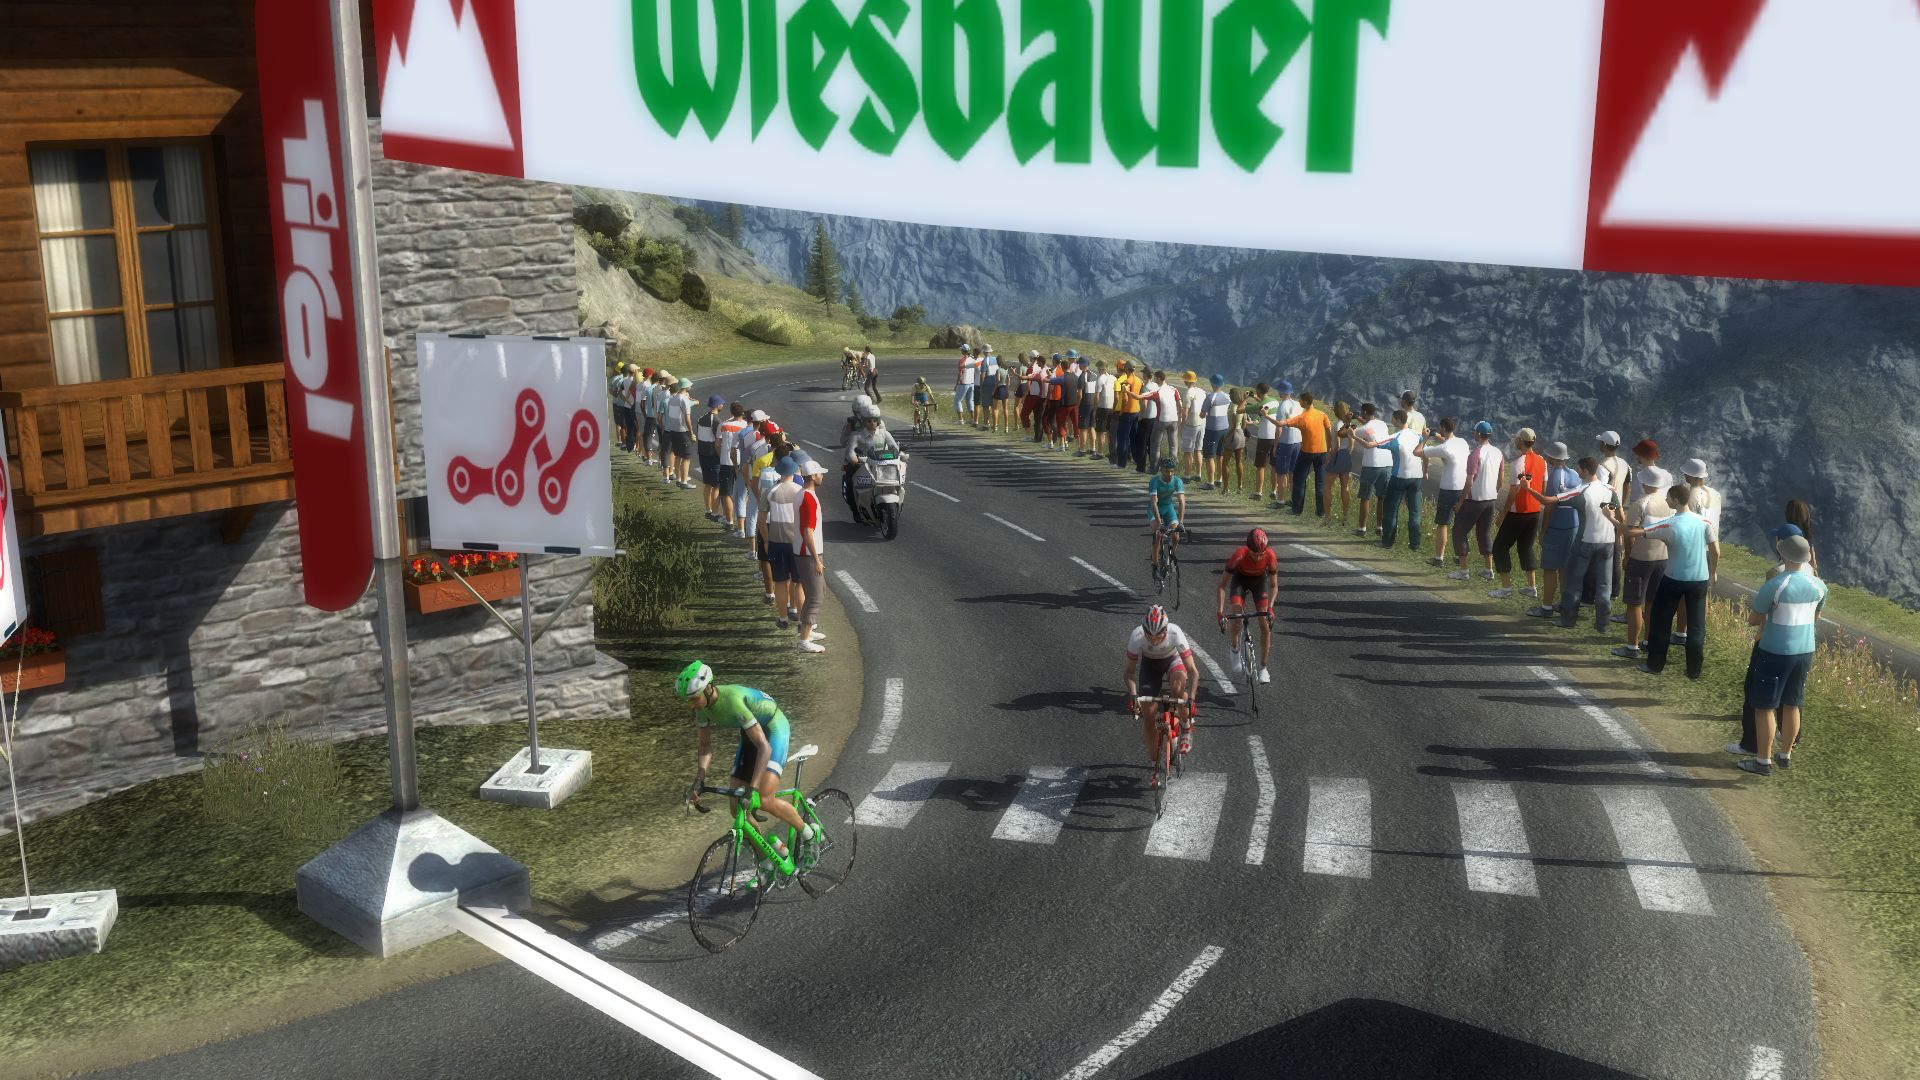 pcmdaily.com/images/mg/2020/Reports/HC/Austria/S4/mg20_austria_s04_32.jpg